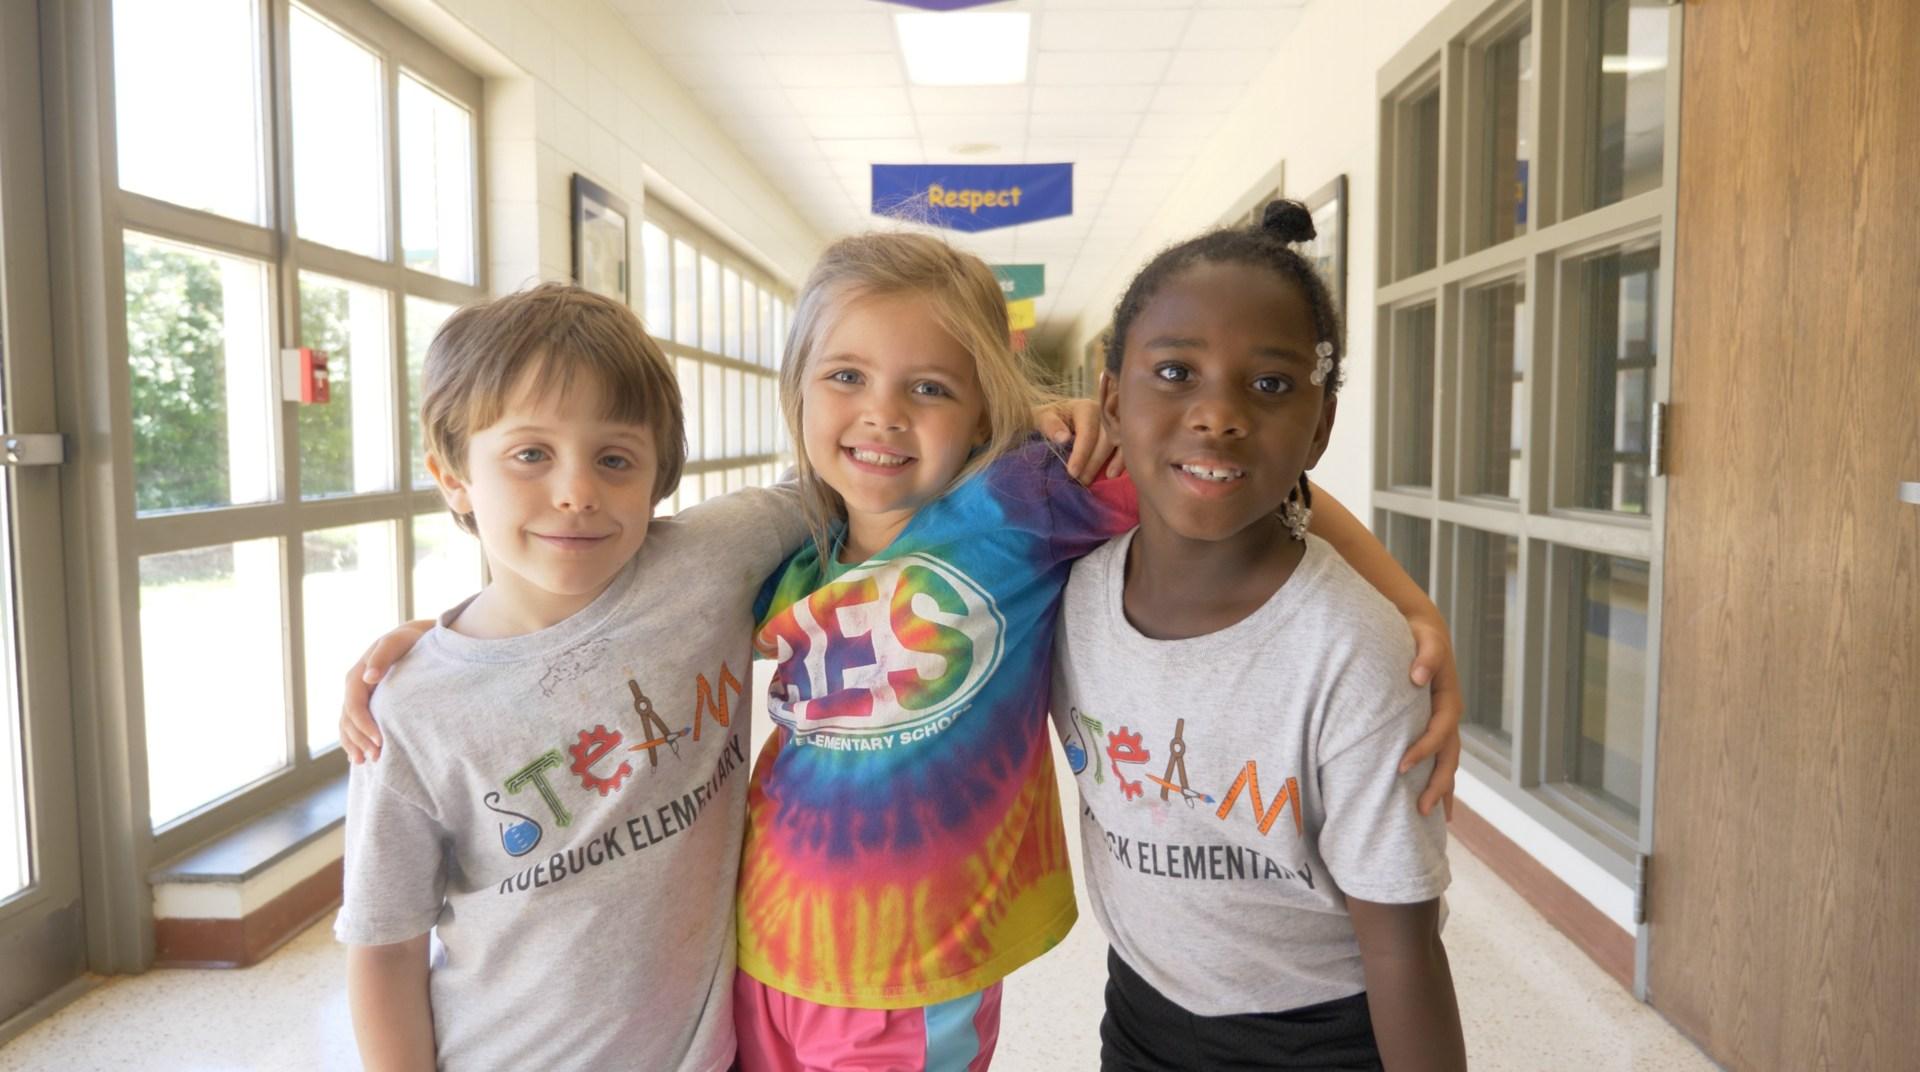 Kids smiling in hallway